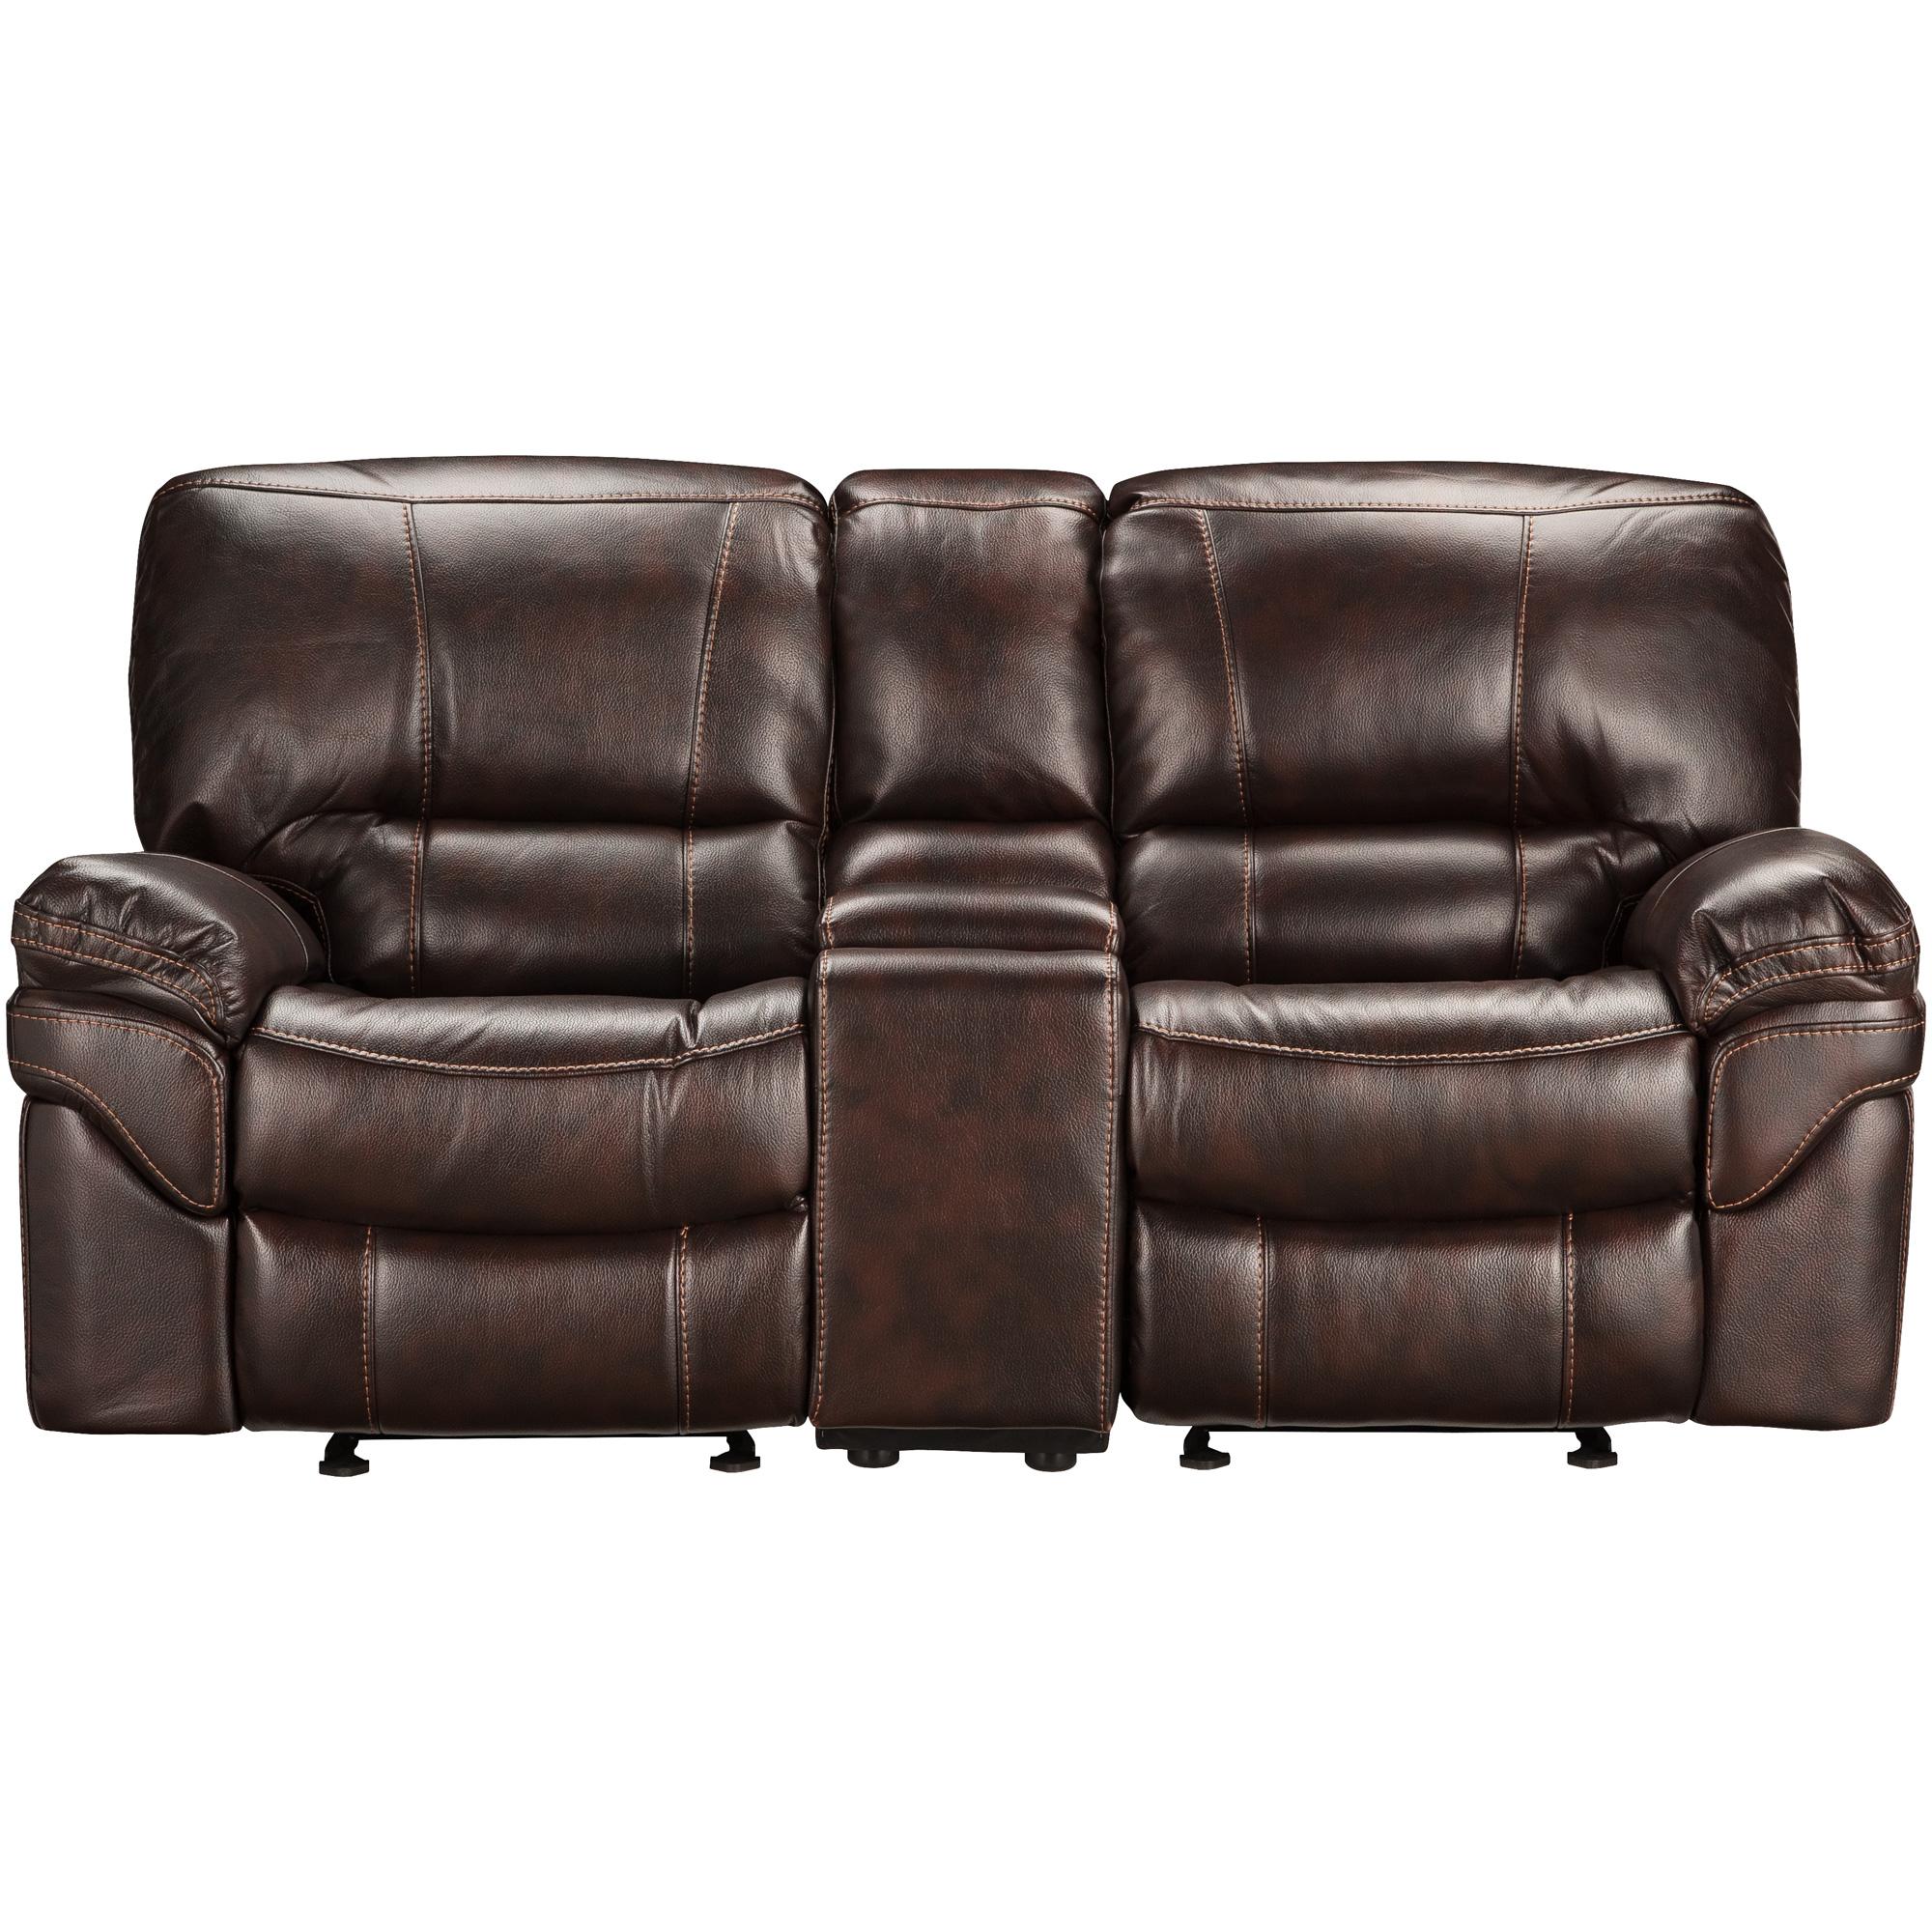 Wah Cheers | Valdez Brown Glider Console Loveseat Sofa